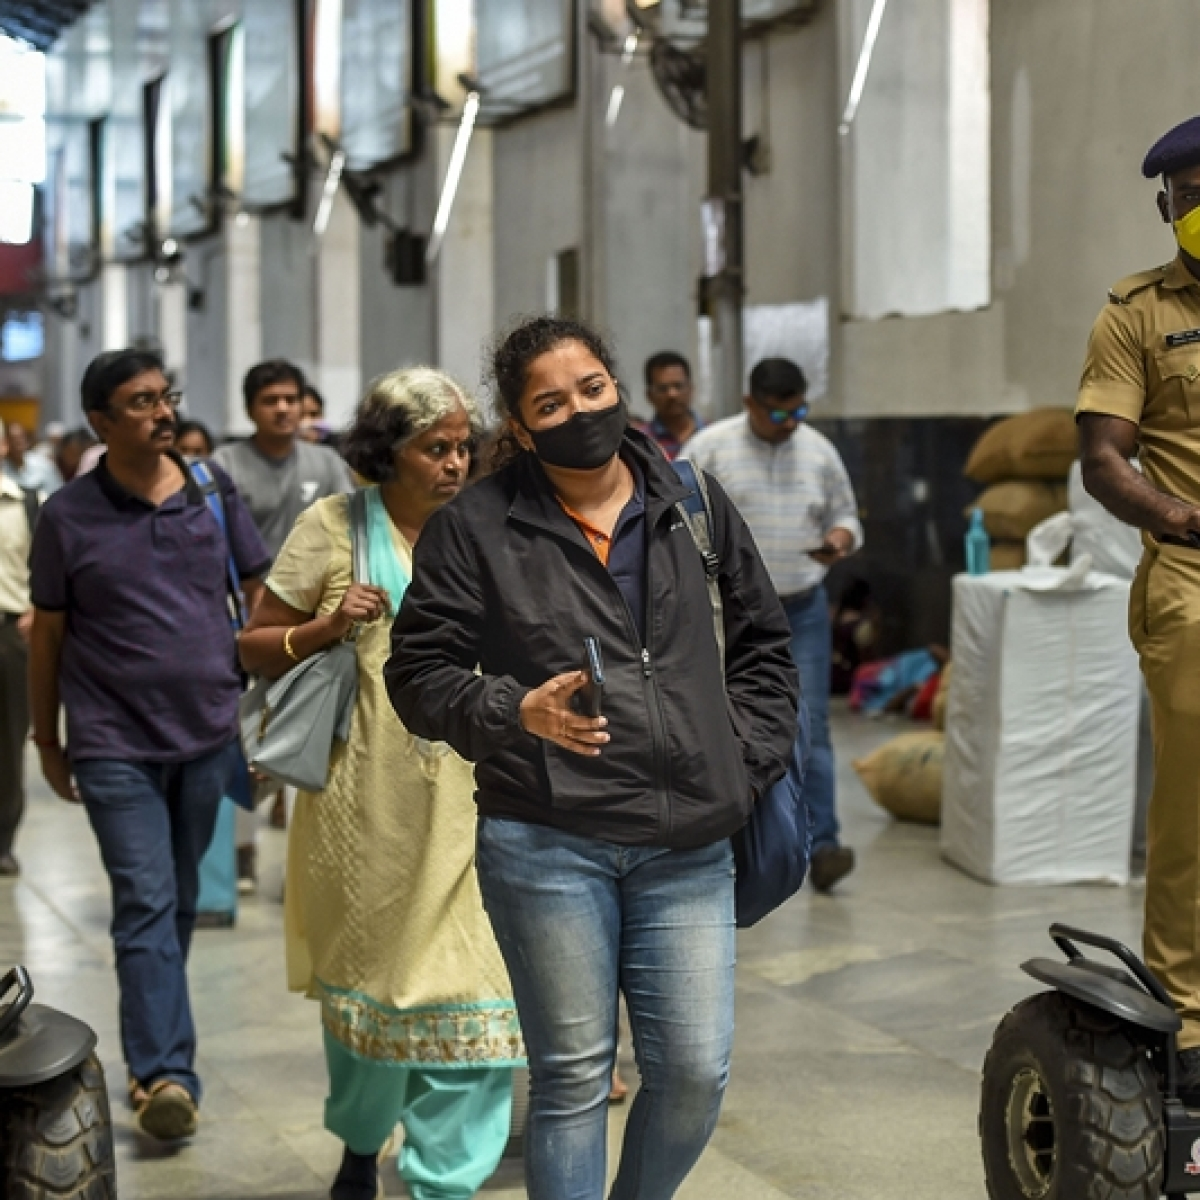 Coronavirus Update in Madhya Pradesh: Over 2000 cancelling air tickets every day